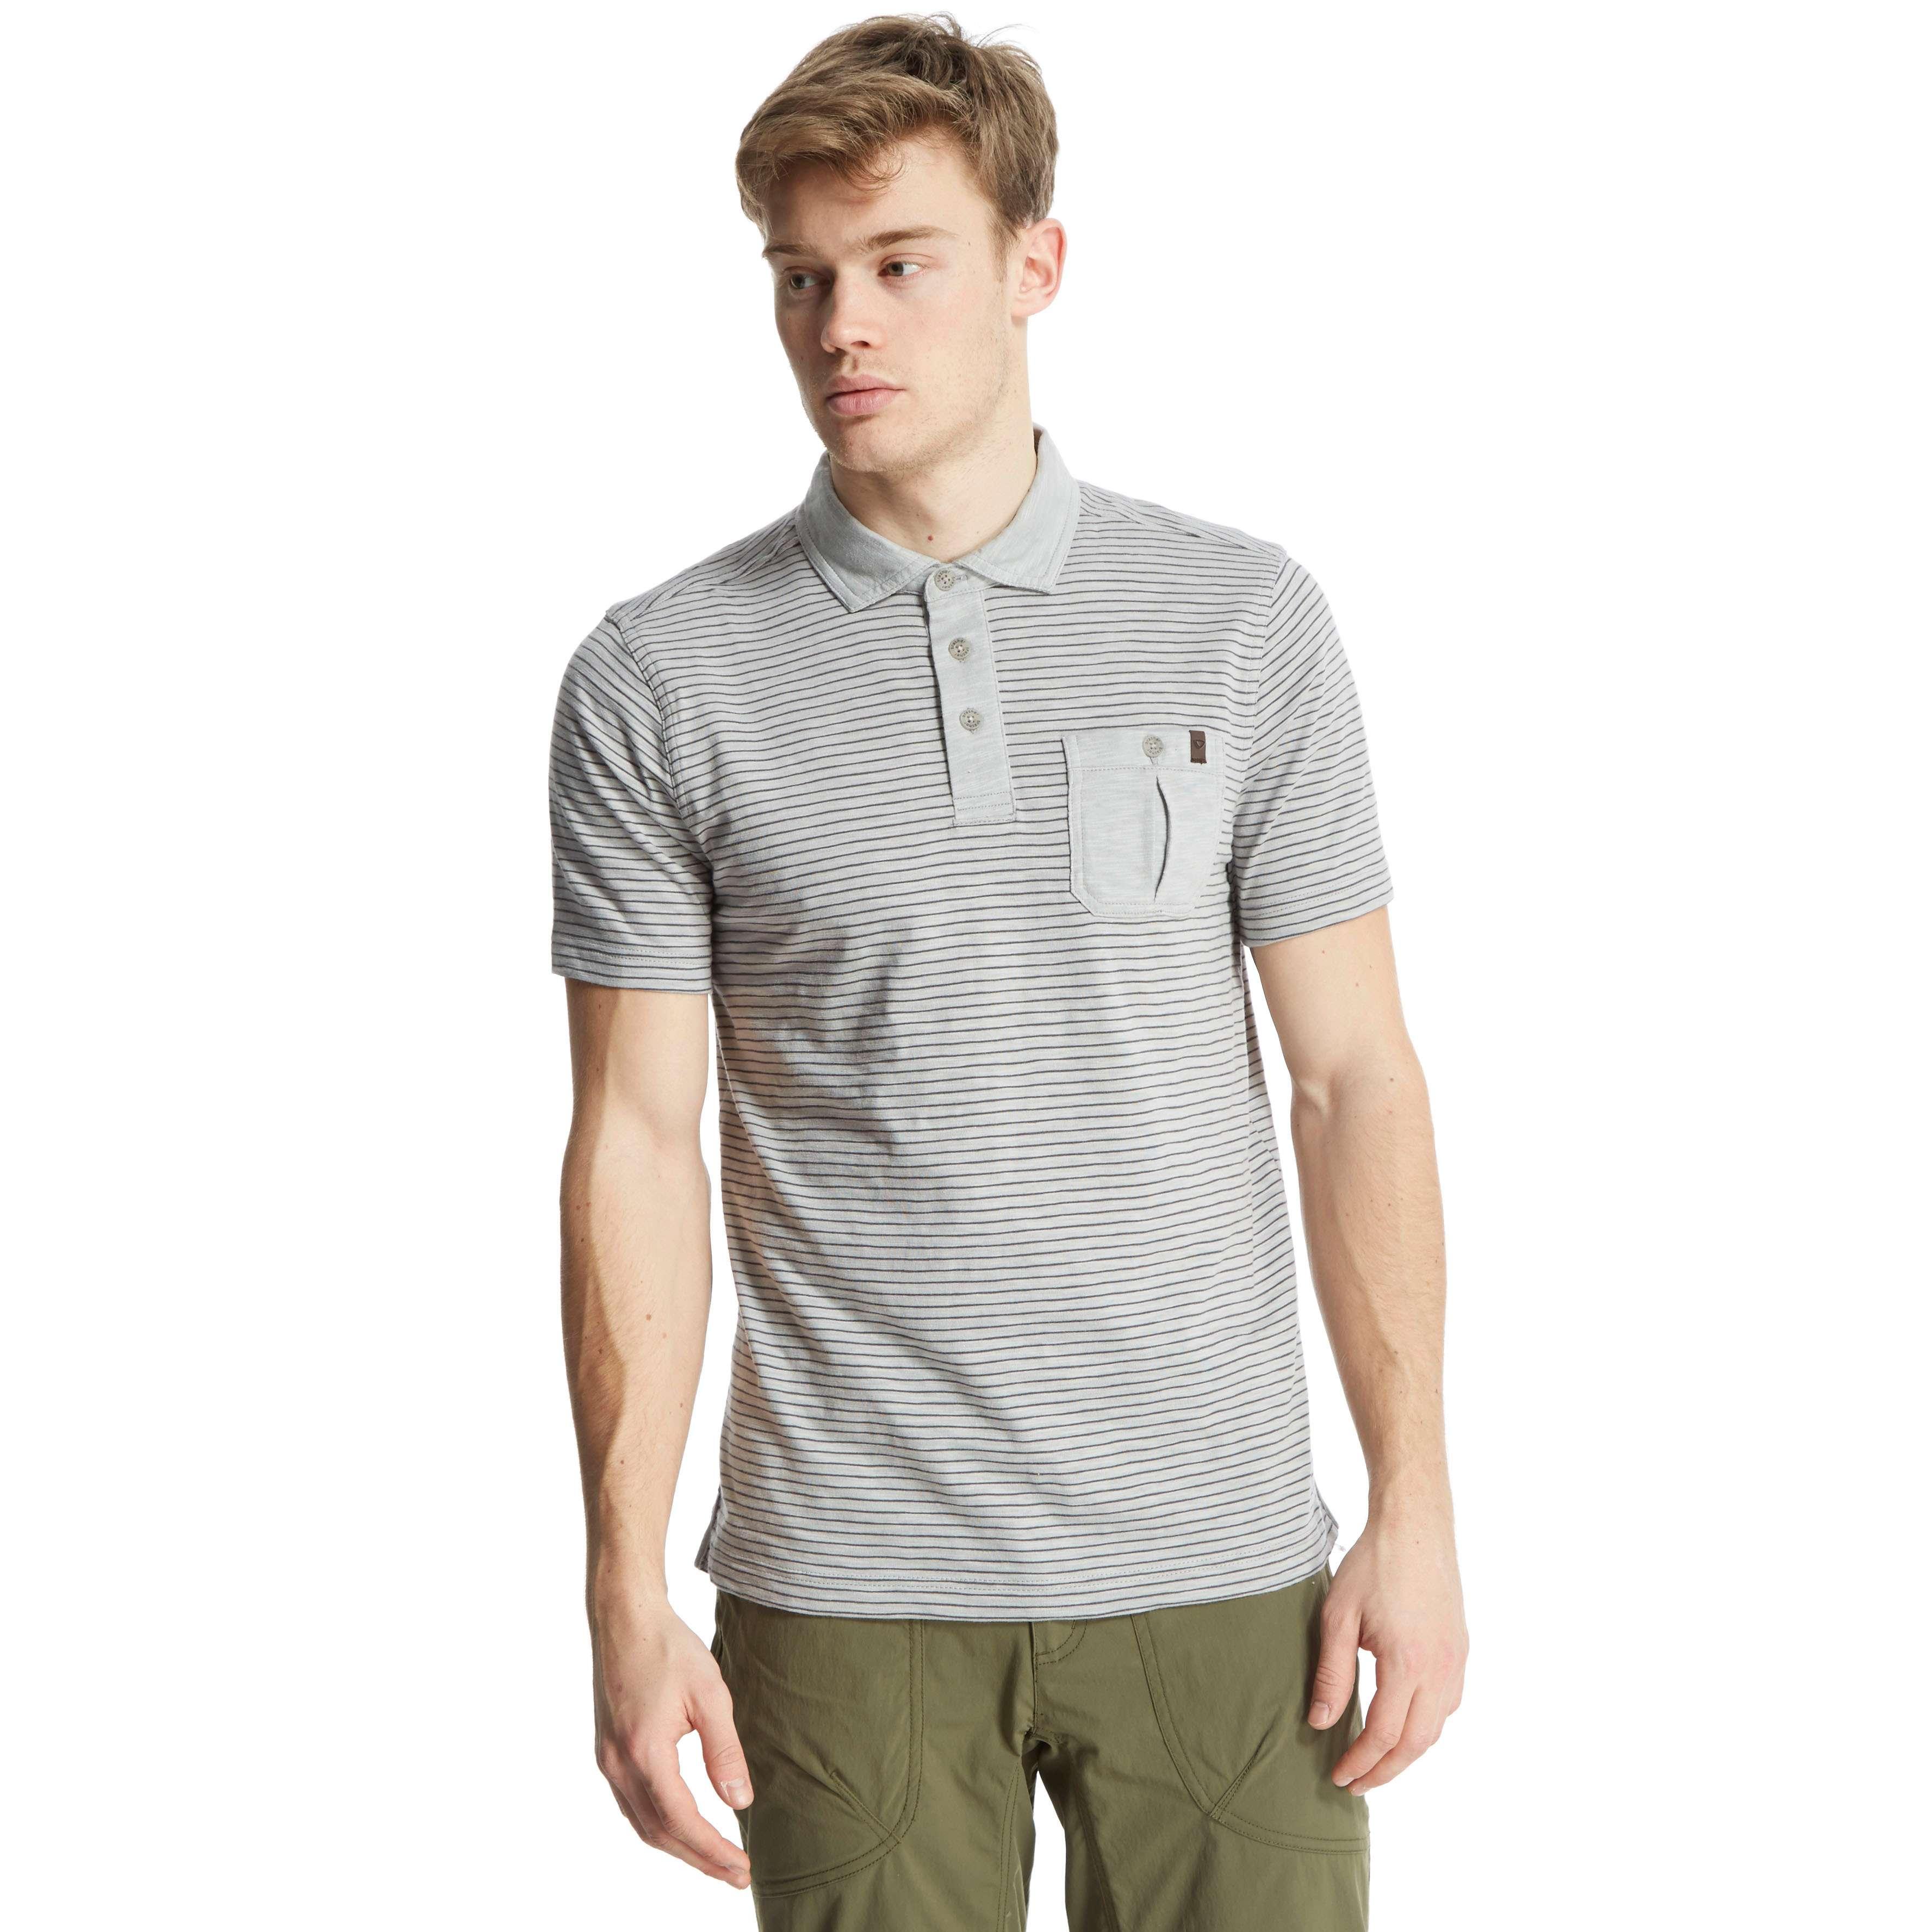 BRASHER Men's Robinson Stripe Polo Shirt